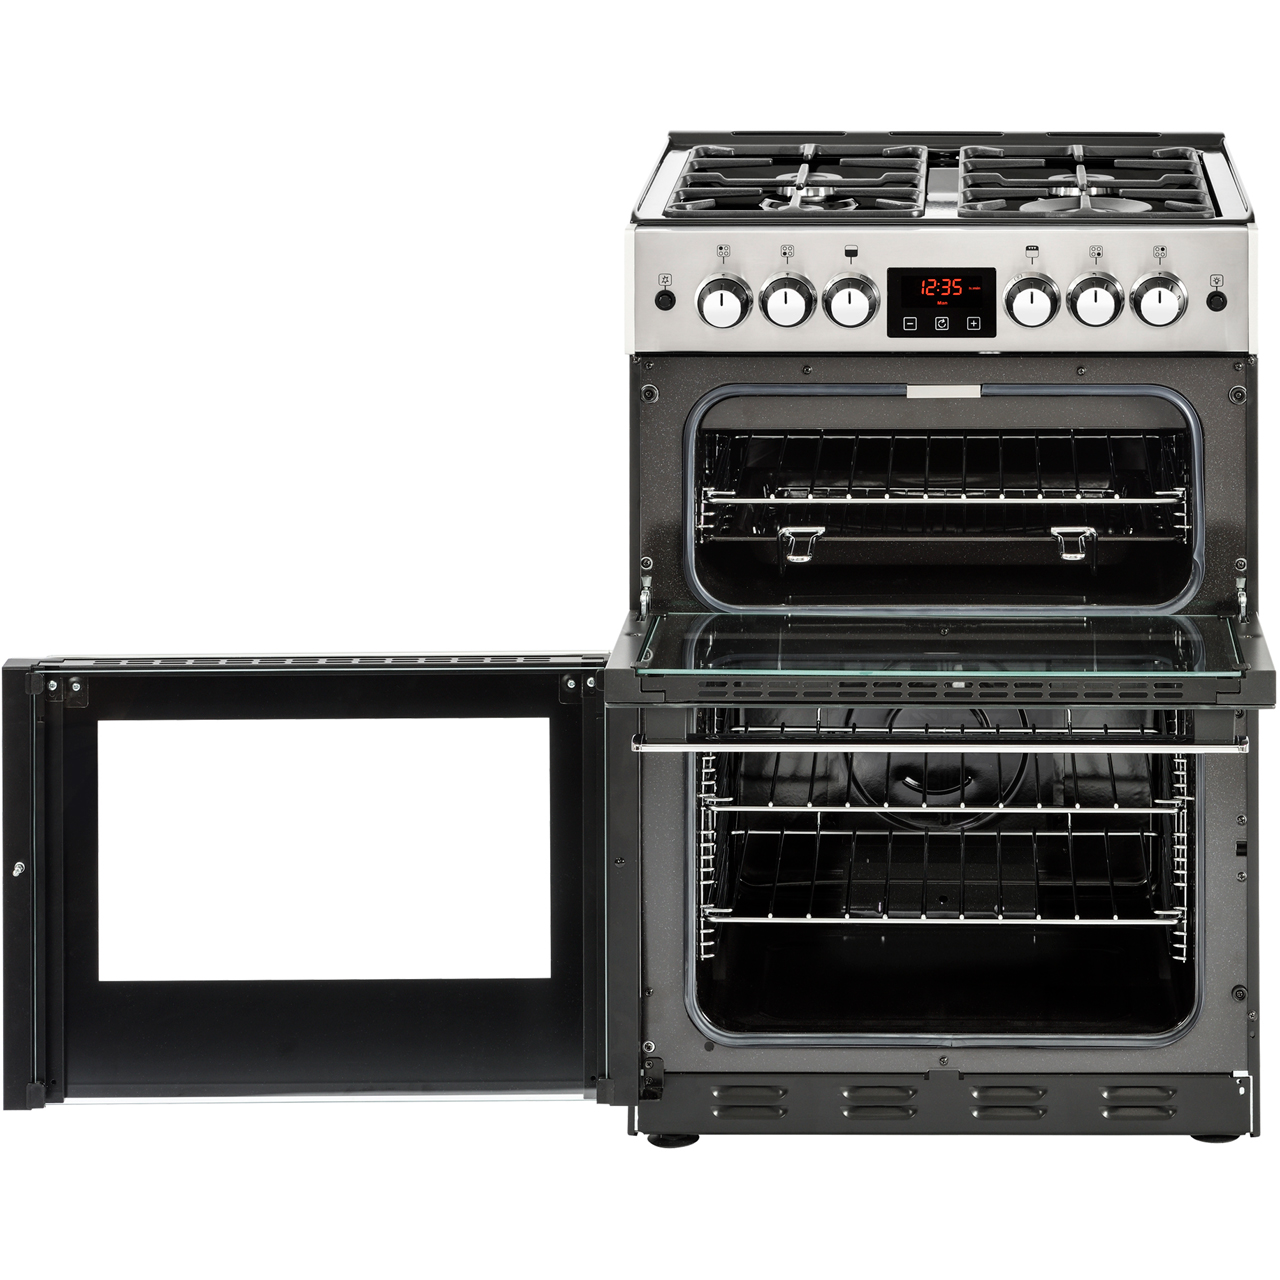 Belling Cookcentre 60G Gas Cooker - Black